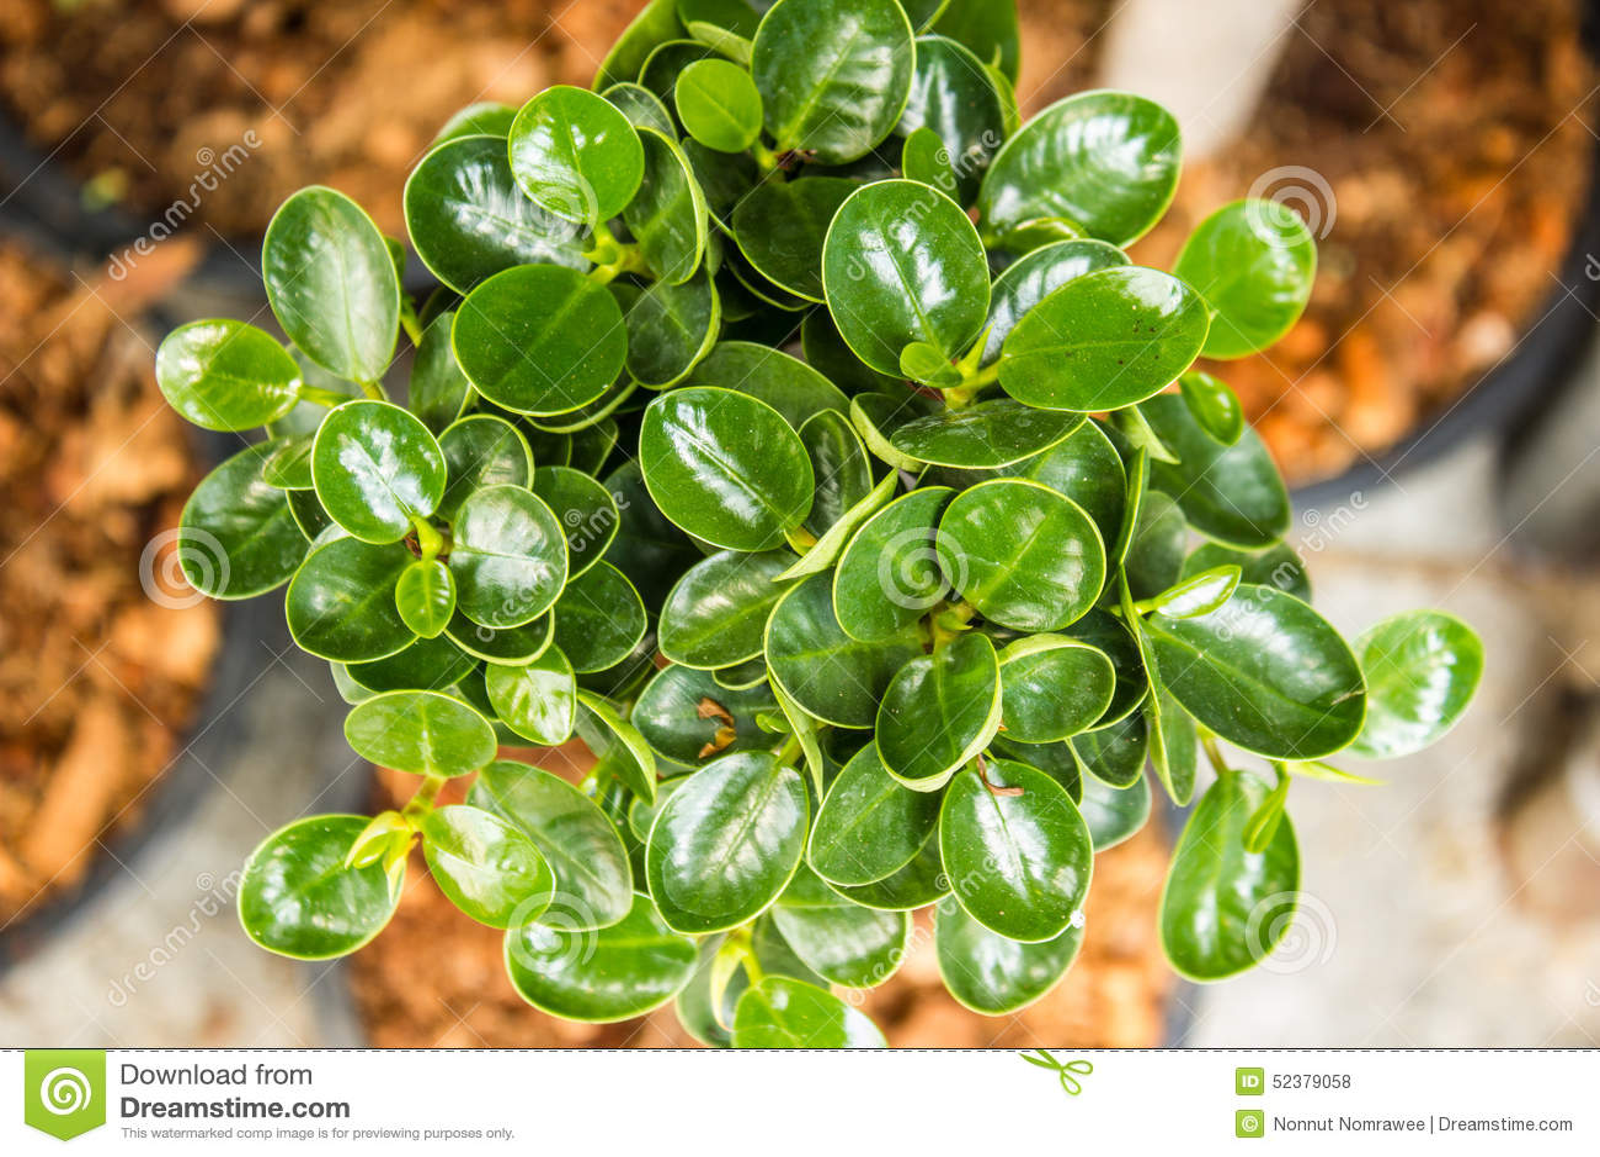 Ornamental plants green stock photo image of lush design for Plantas ornamentales